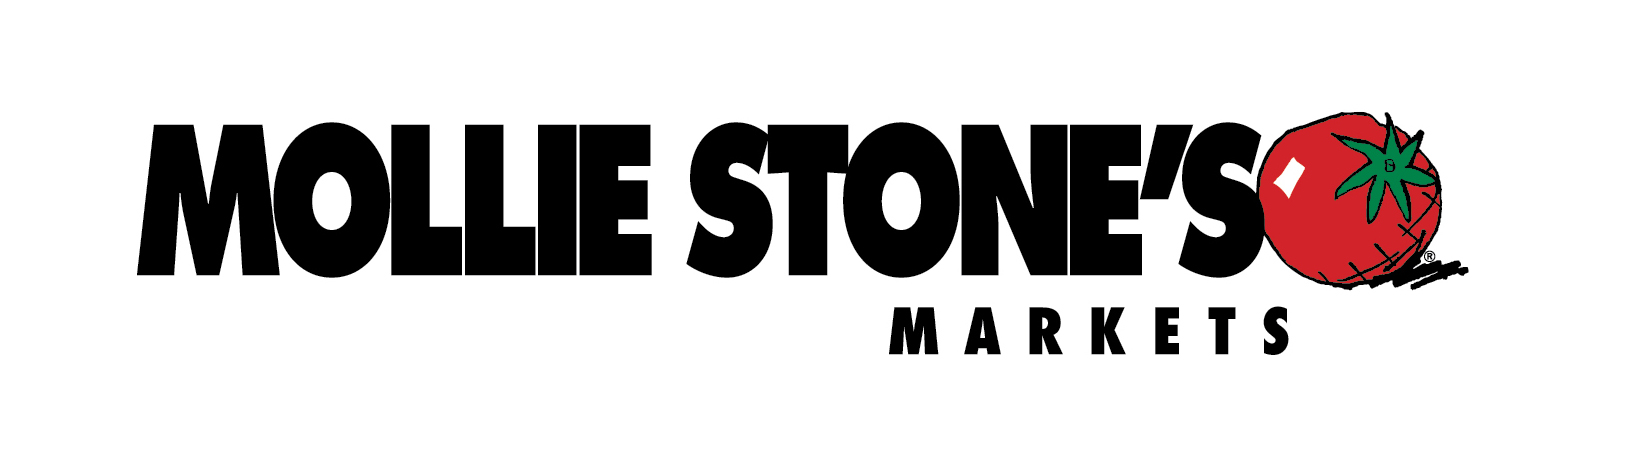 Mollie Stone's Markets